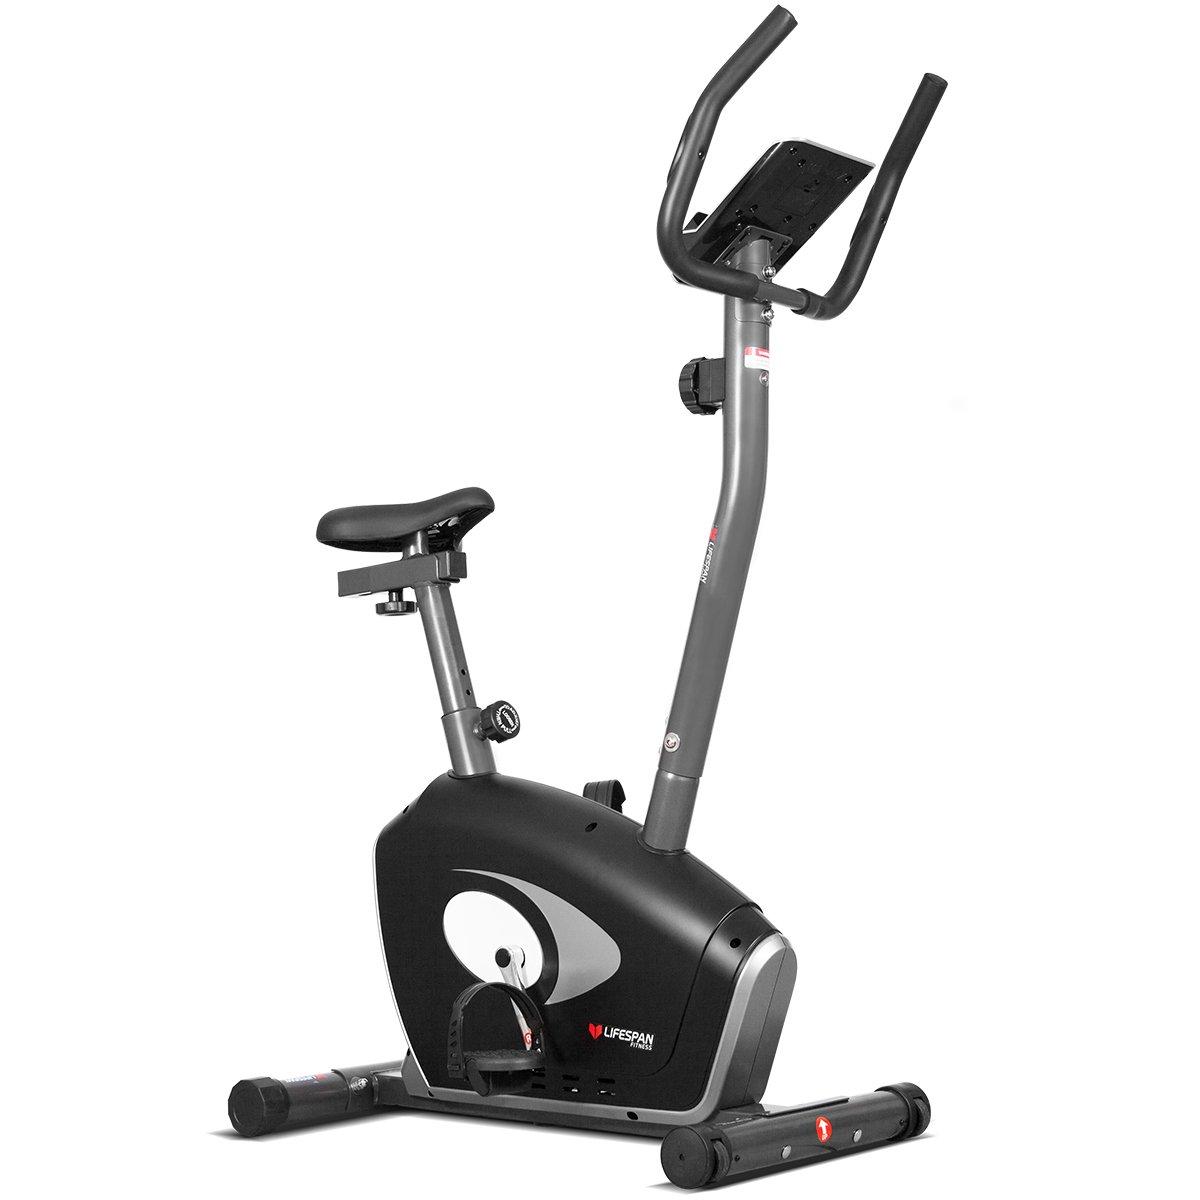 Lifespan Fitness – EXER-58 Exercise Bike